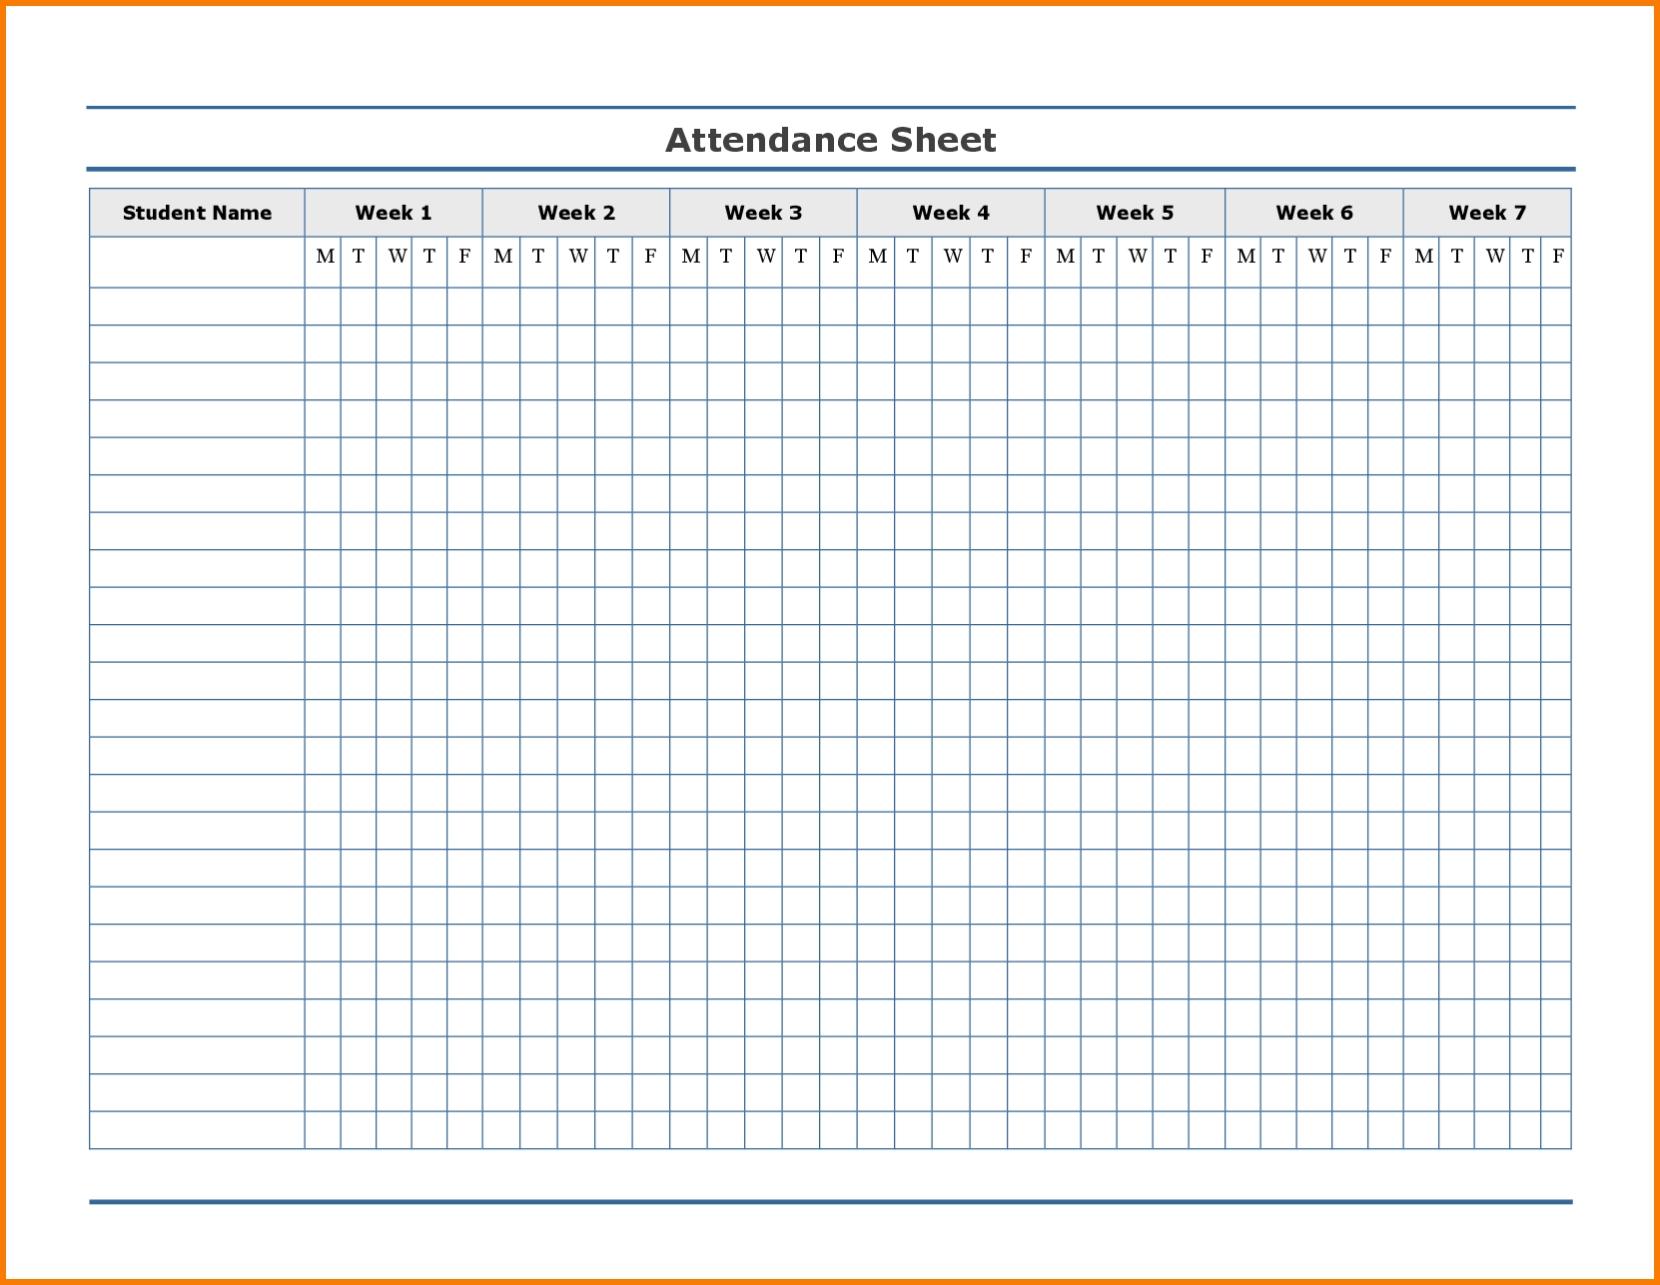 Employee Attendance Excel Sheet | Employee Attendance Sheet throughout Blank Employee Attendance Calendar Monthly